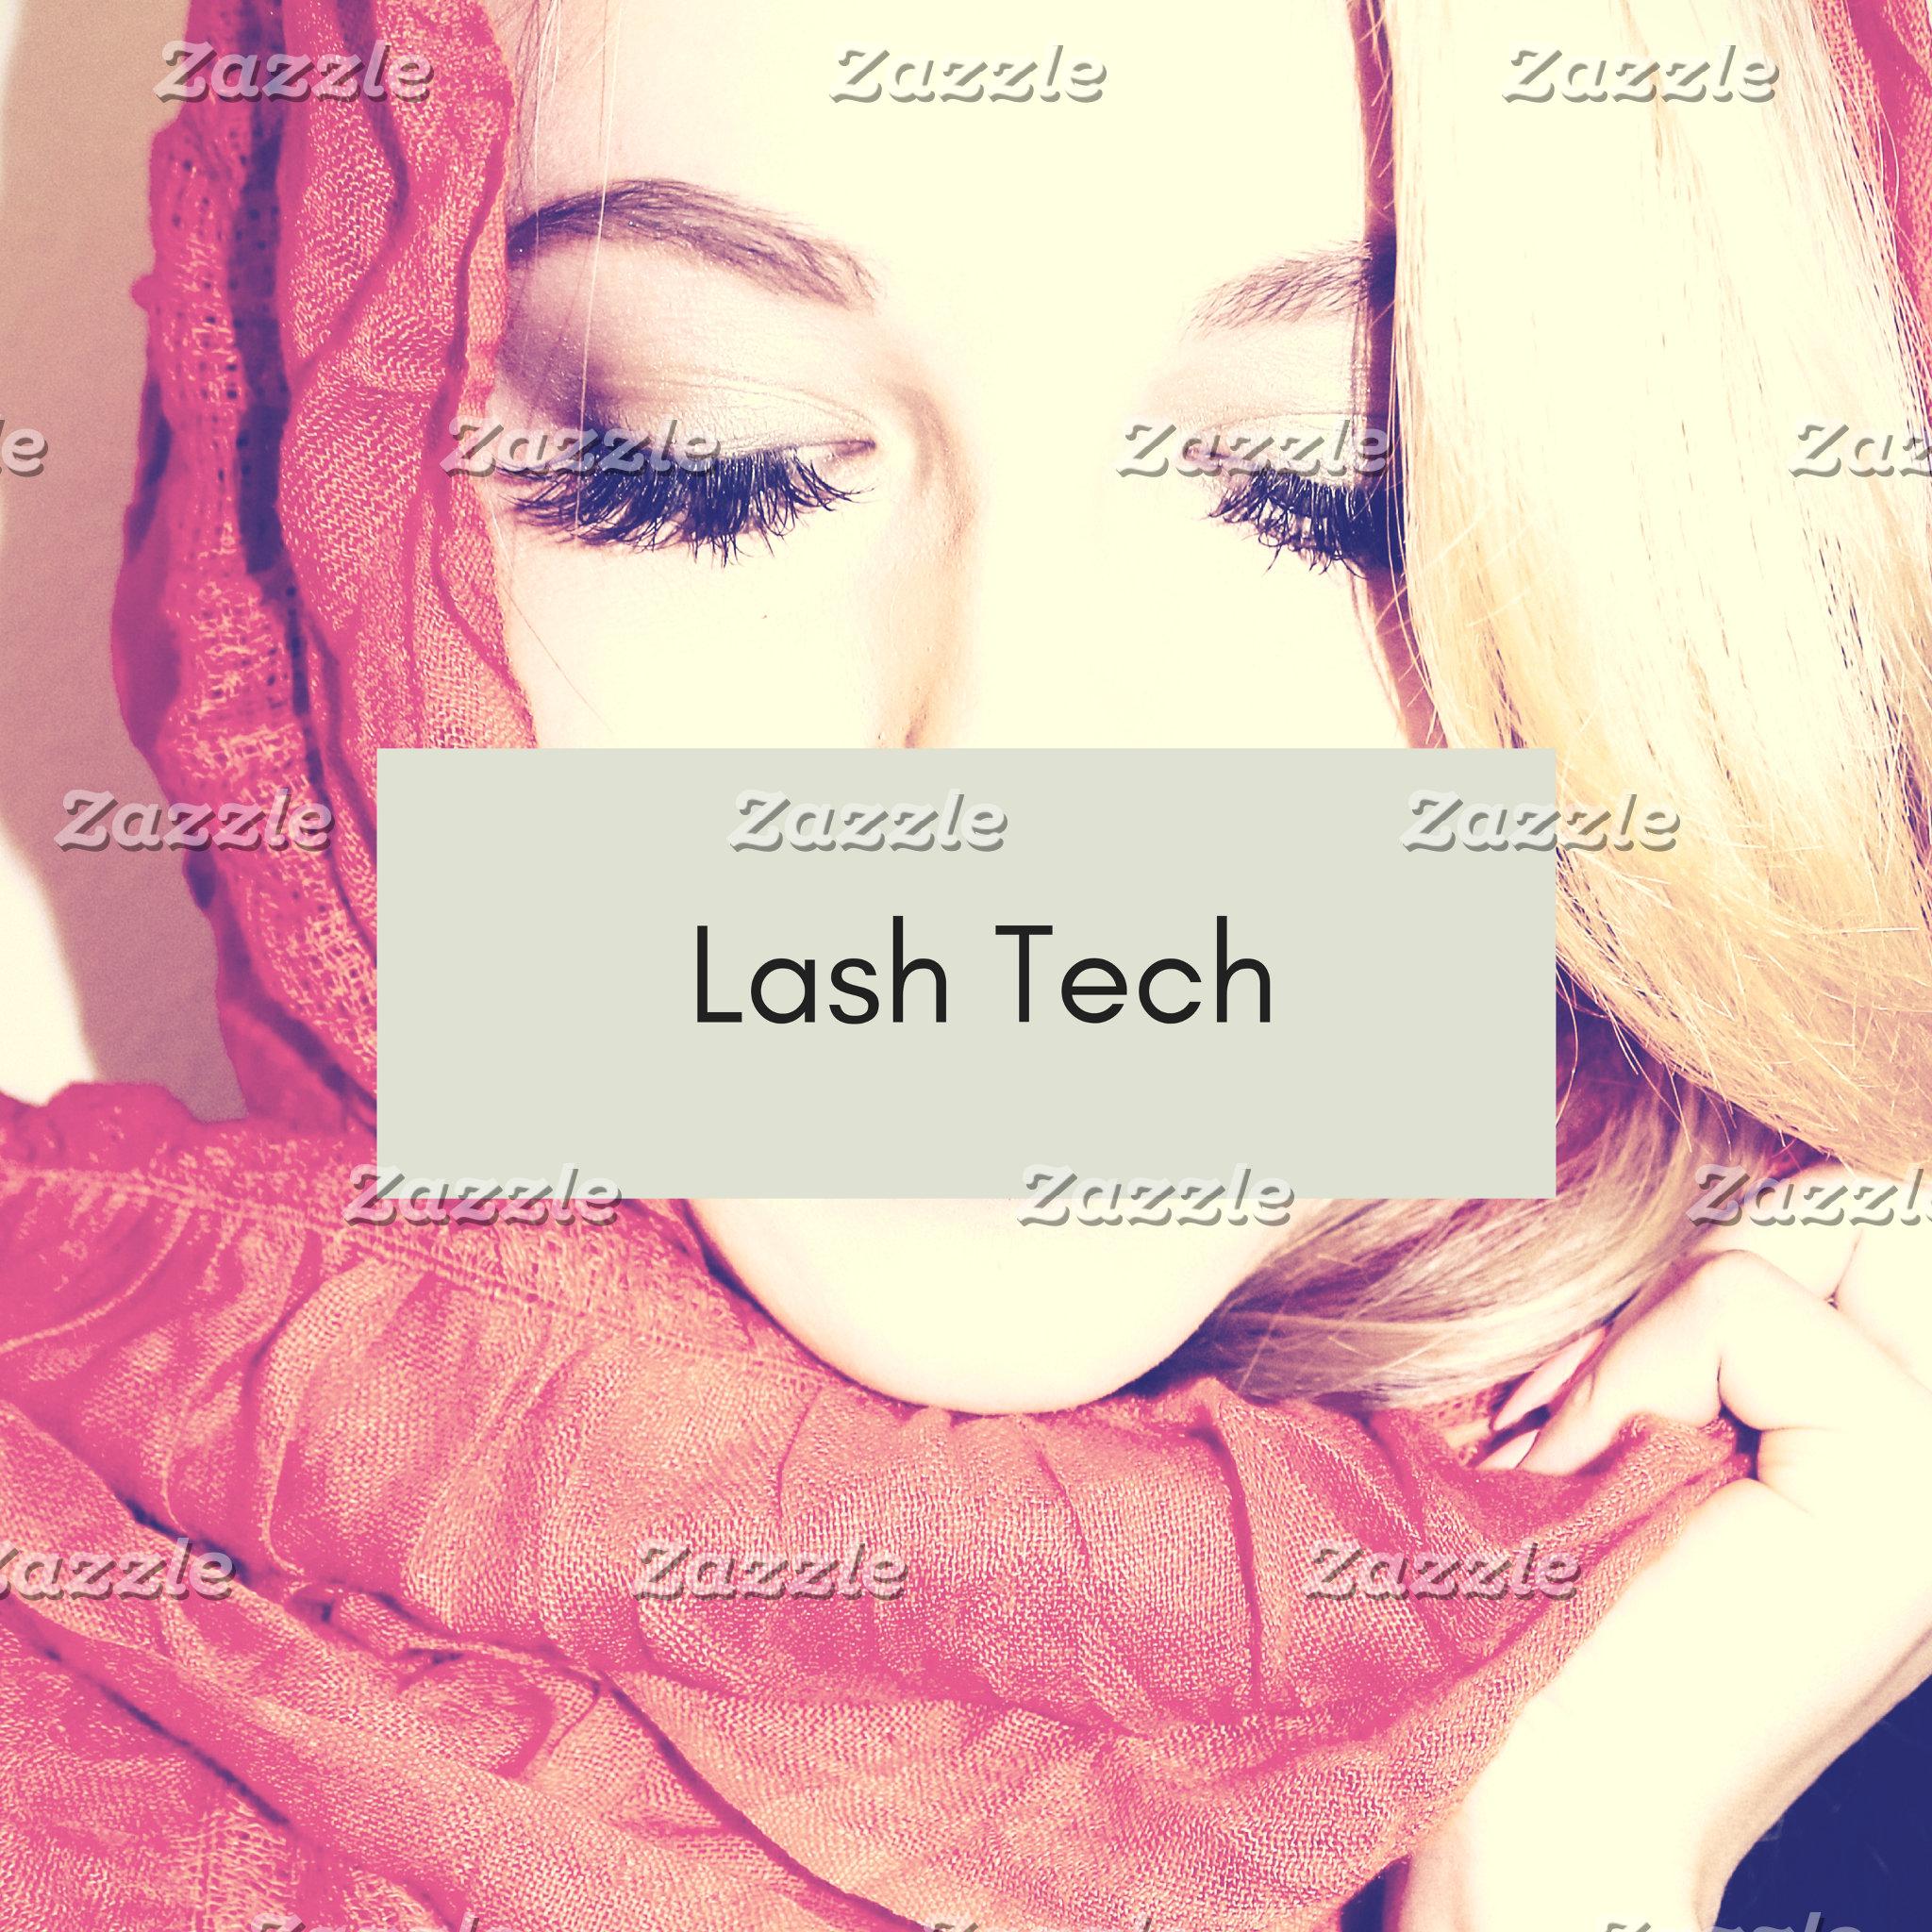 Lash Tech